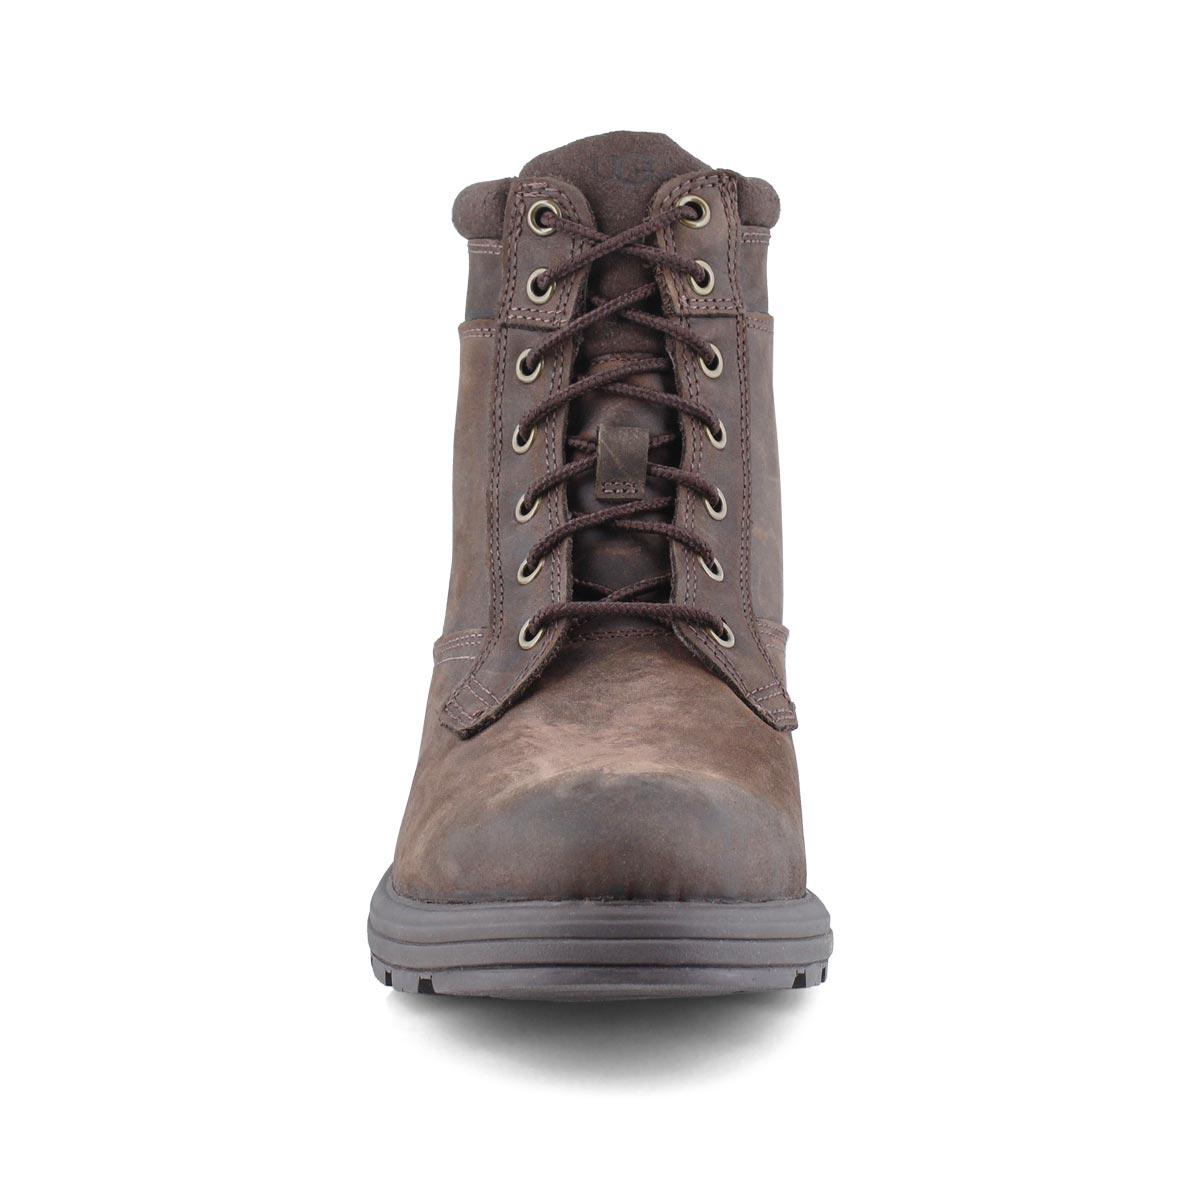 Men's Biltmore Waterproof Lace Up Boot - Stout